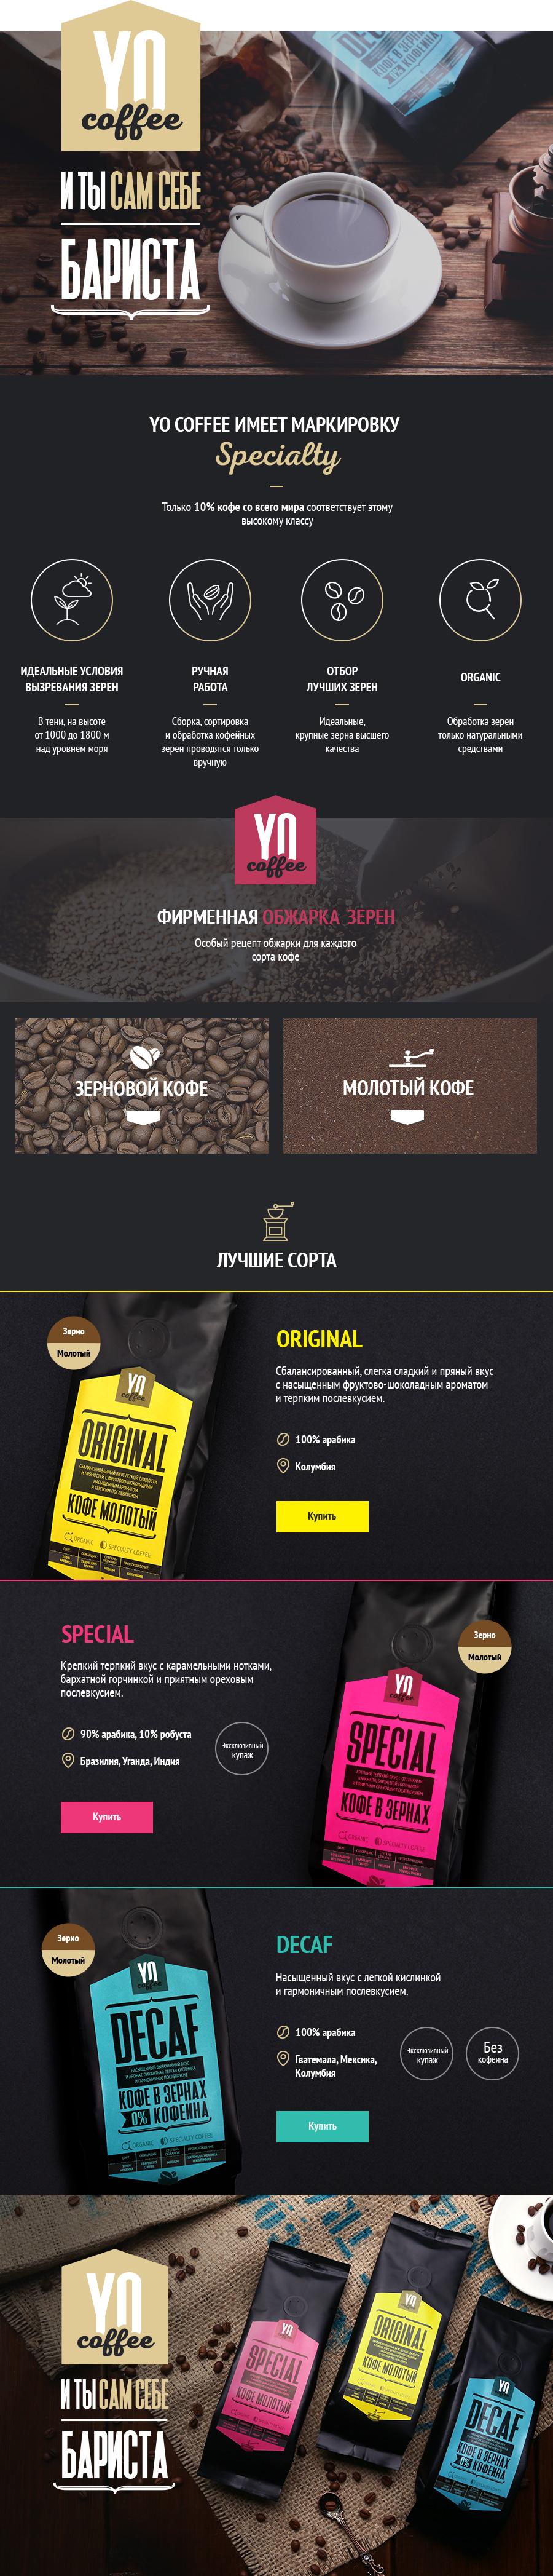 Презентация YO Coffee